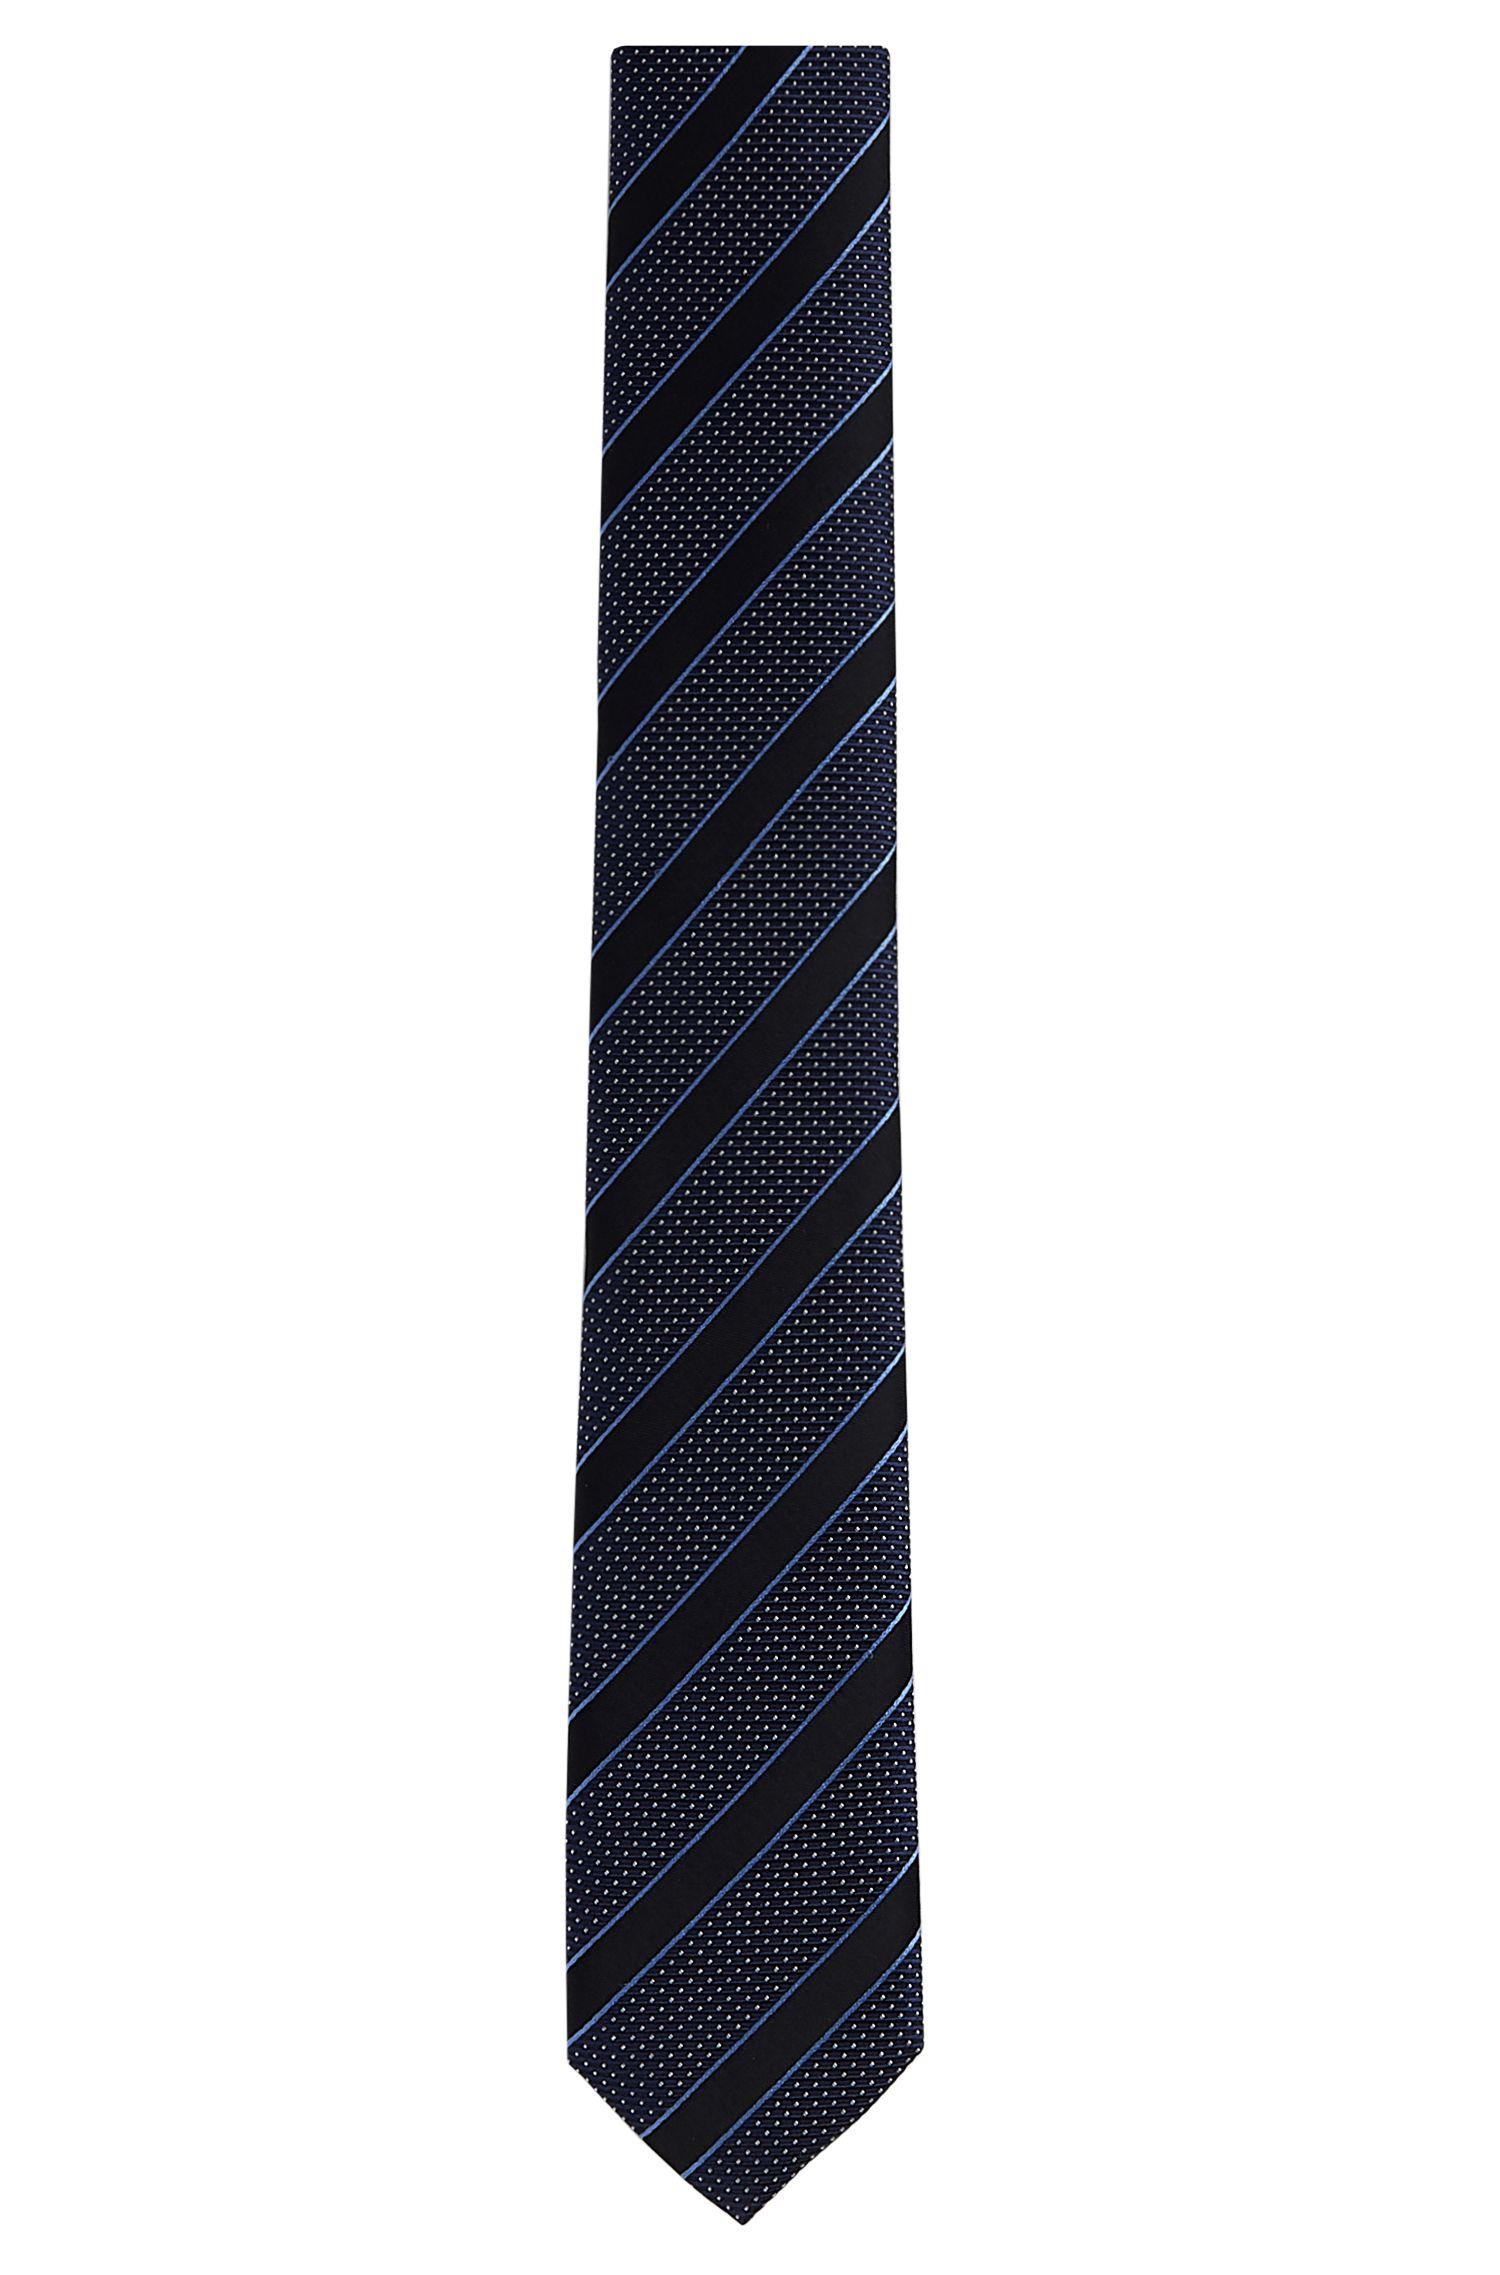 Patterned Silk Tie, Slim | Tie 6 cm Full Lining